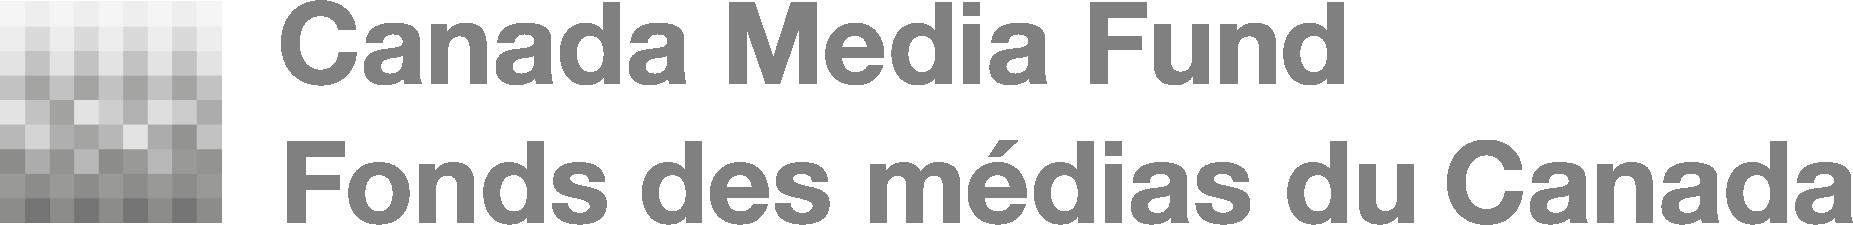 Cmf_logo_bil_gris